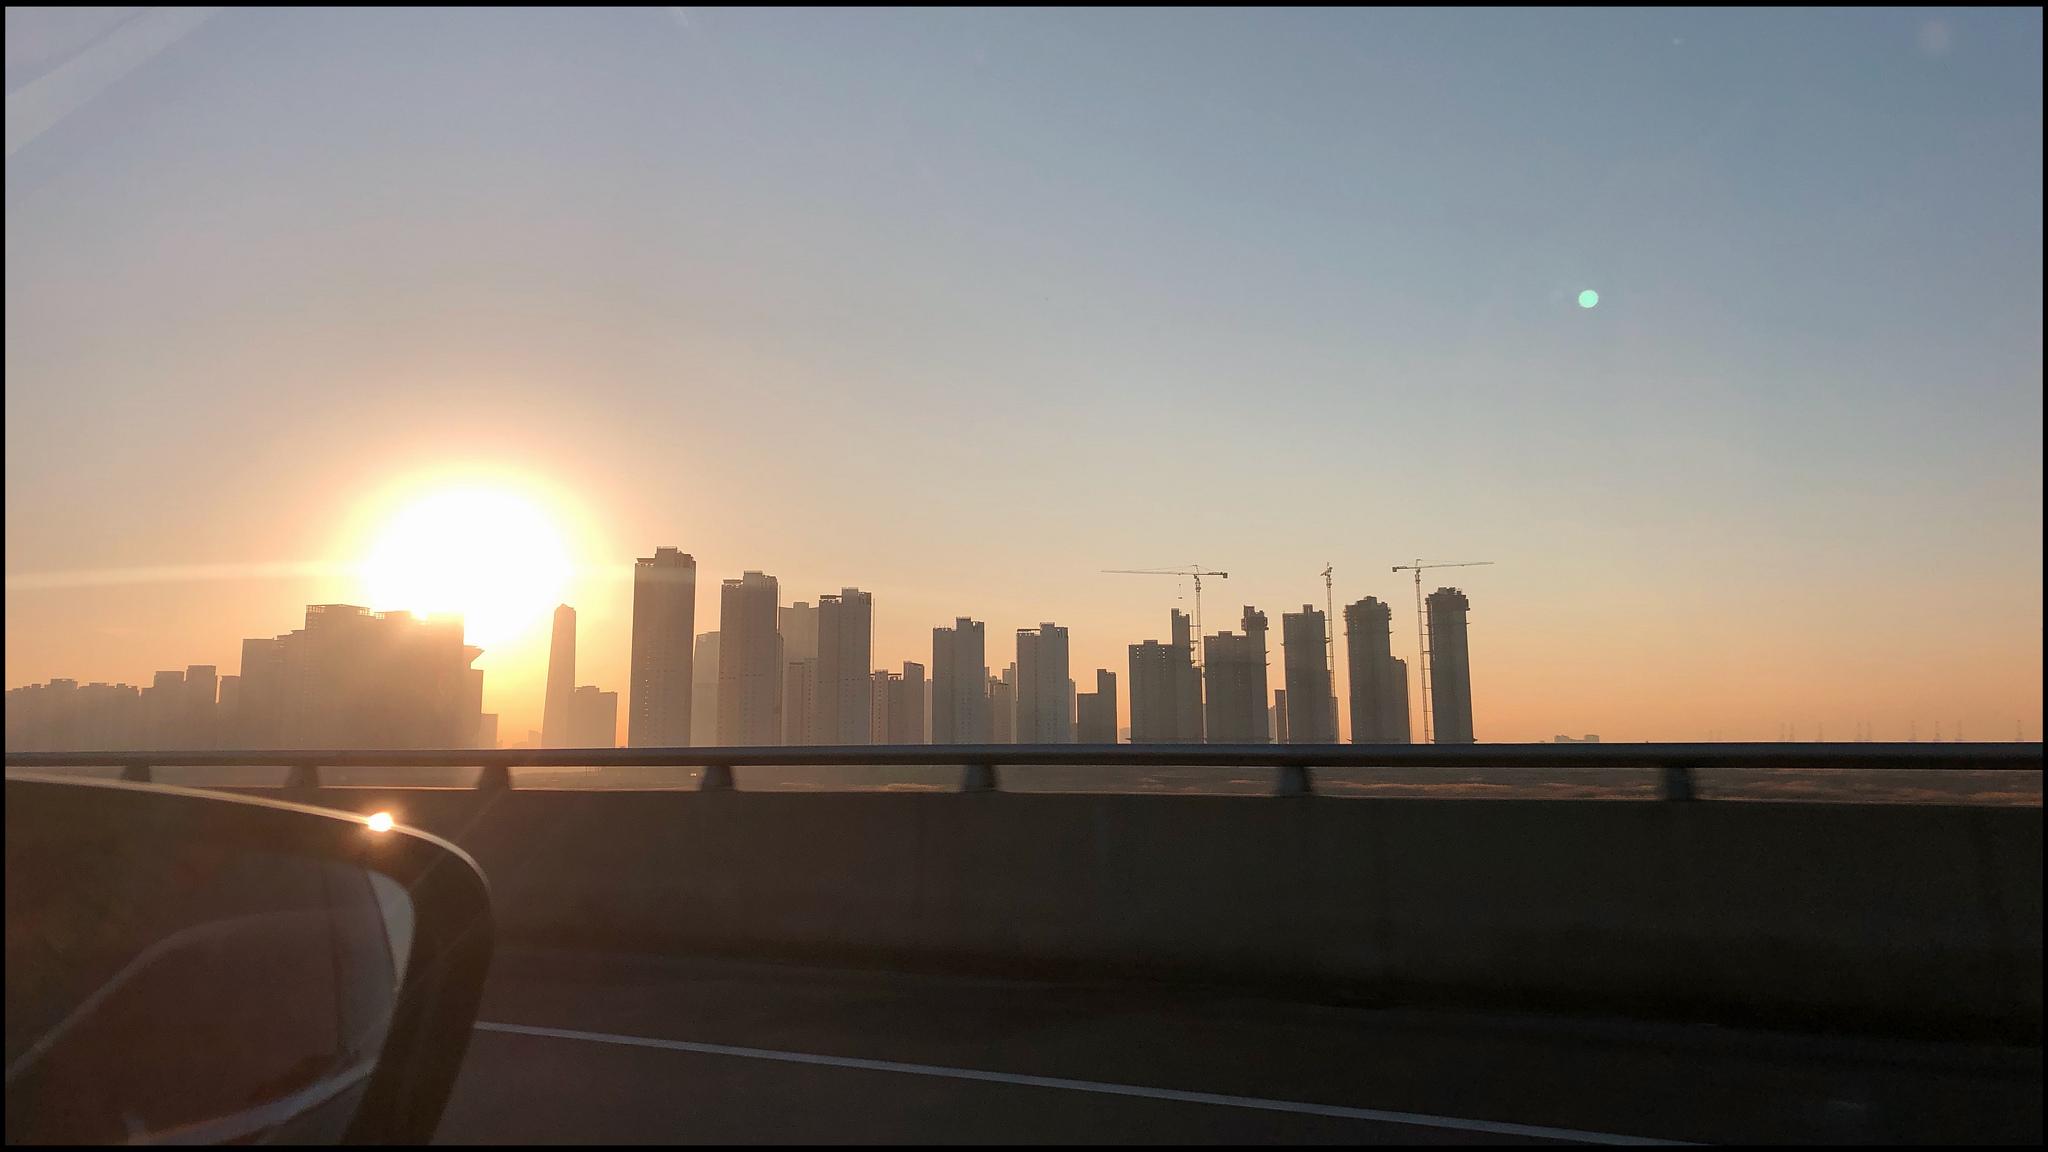 Approaching Seoul